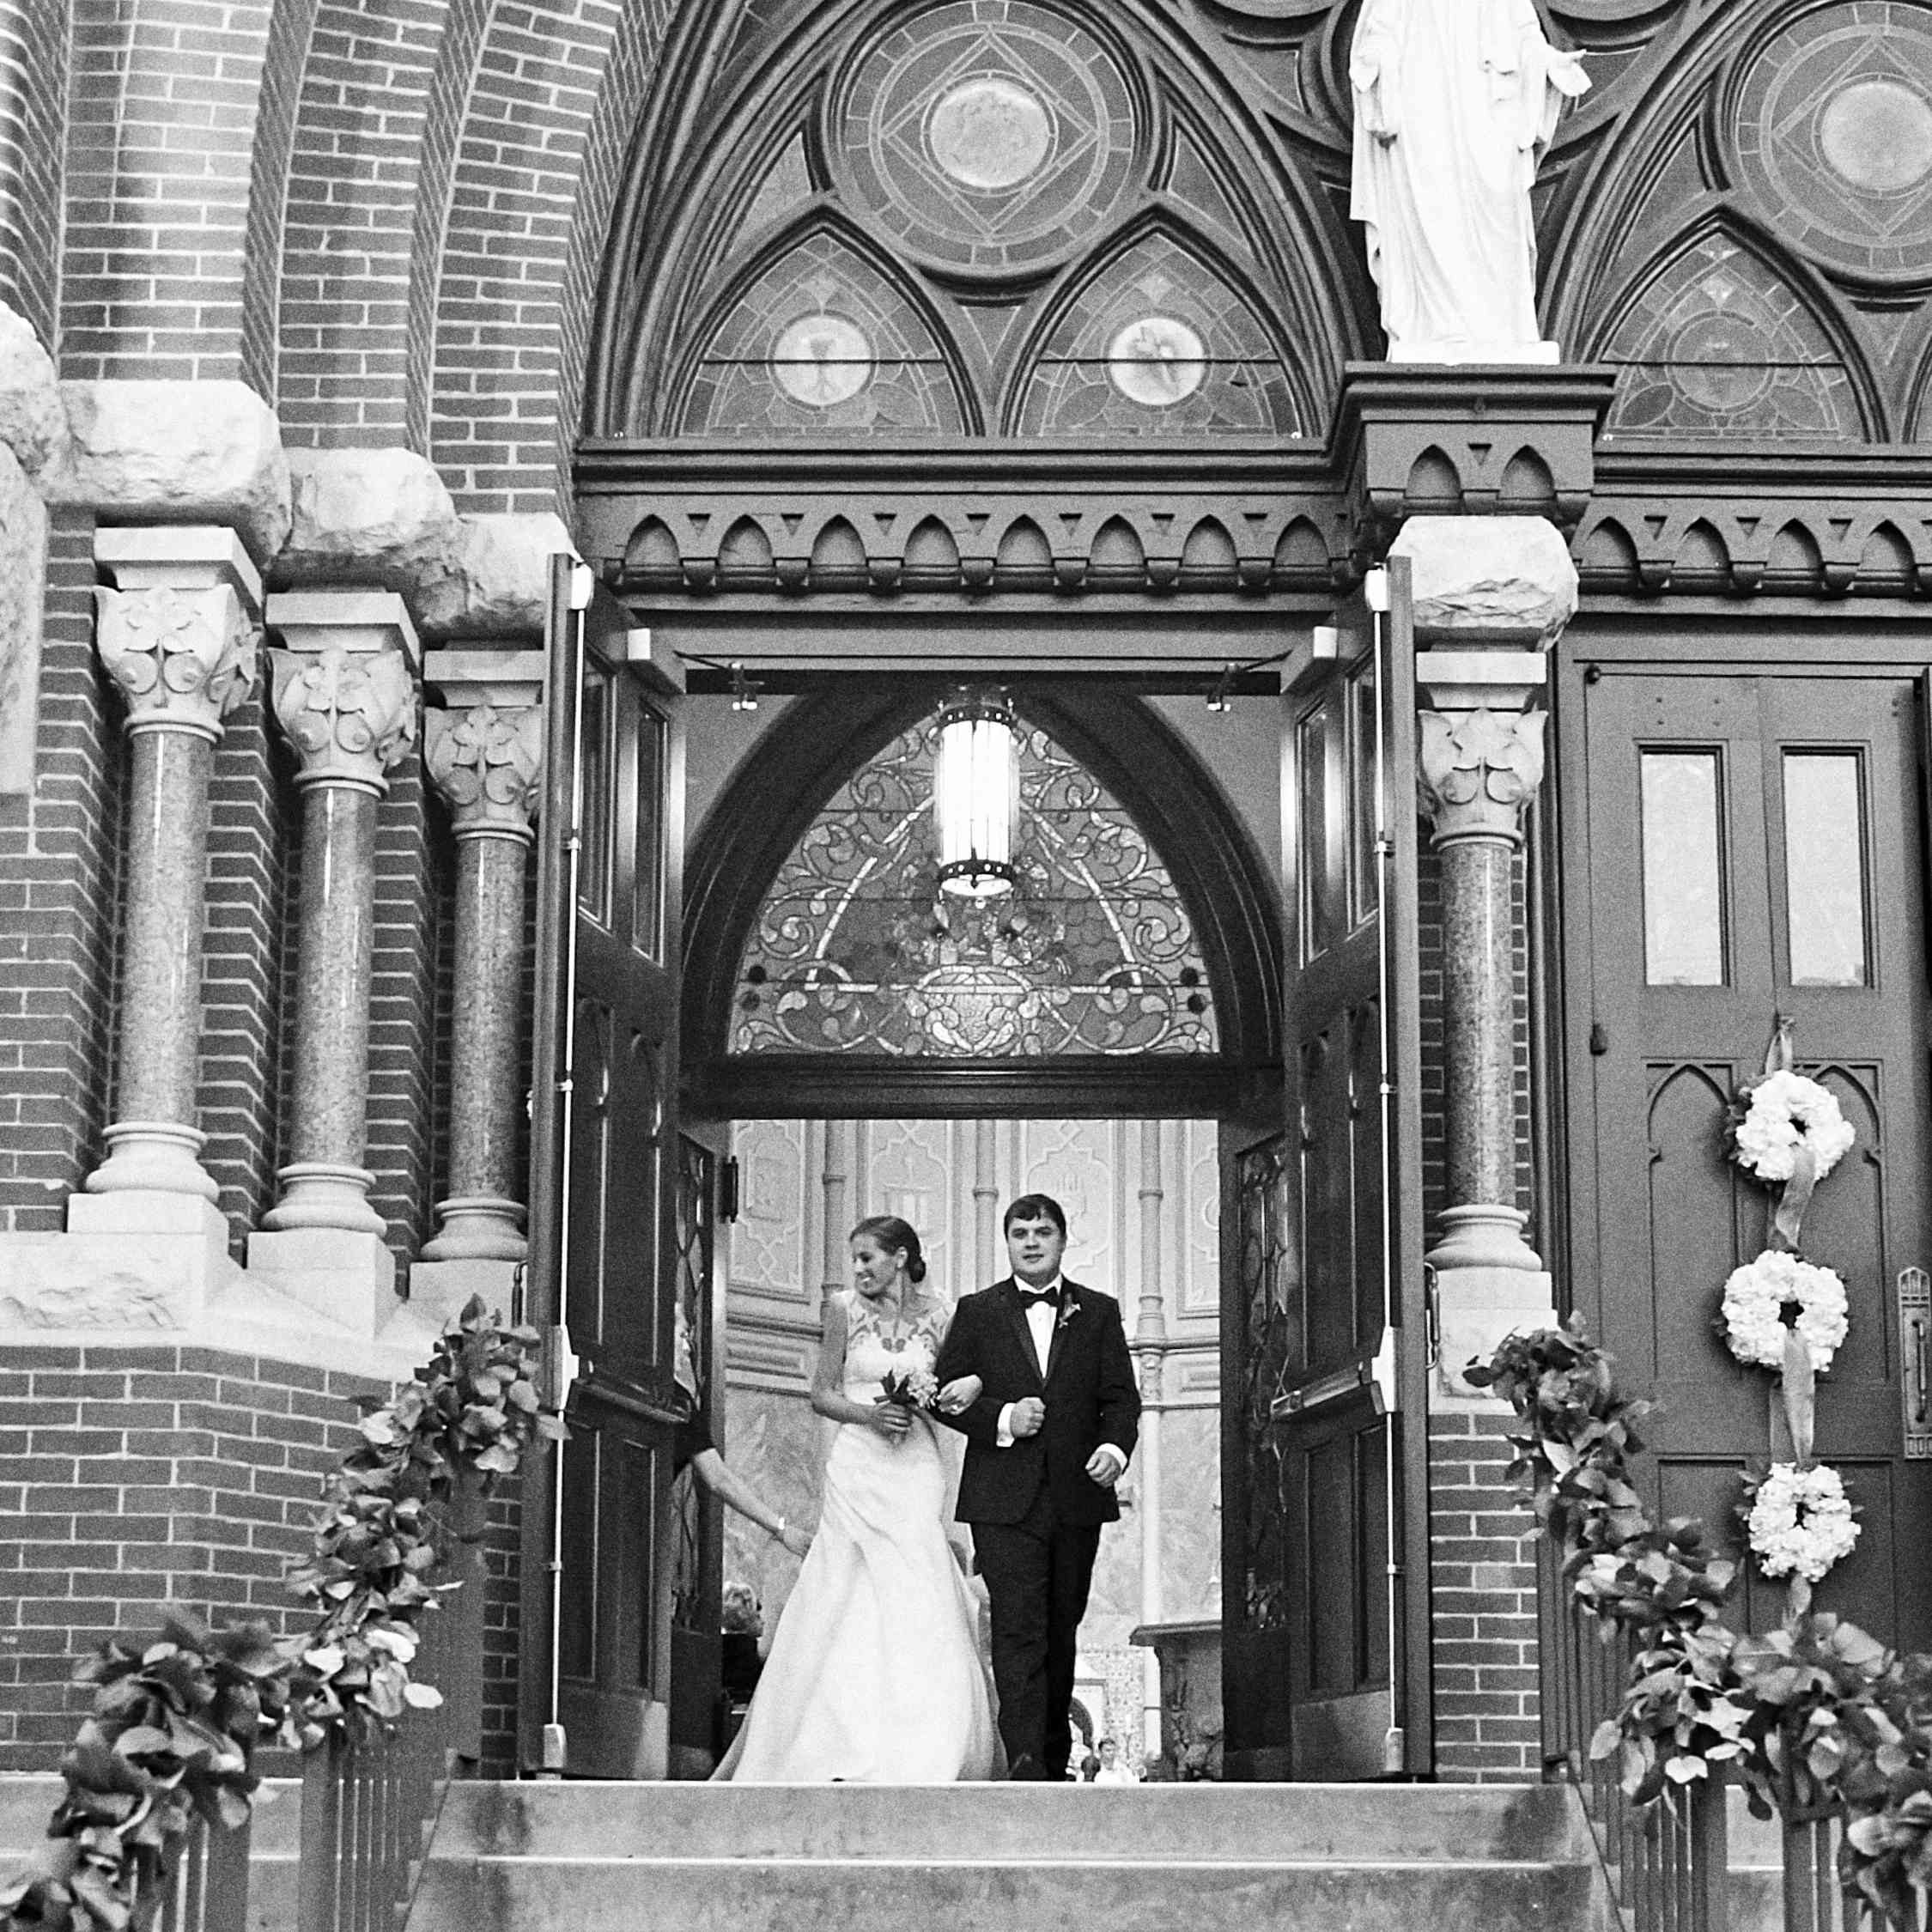 <p>ceremony exit</p><br><br>